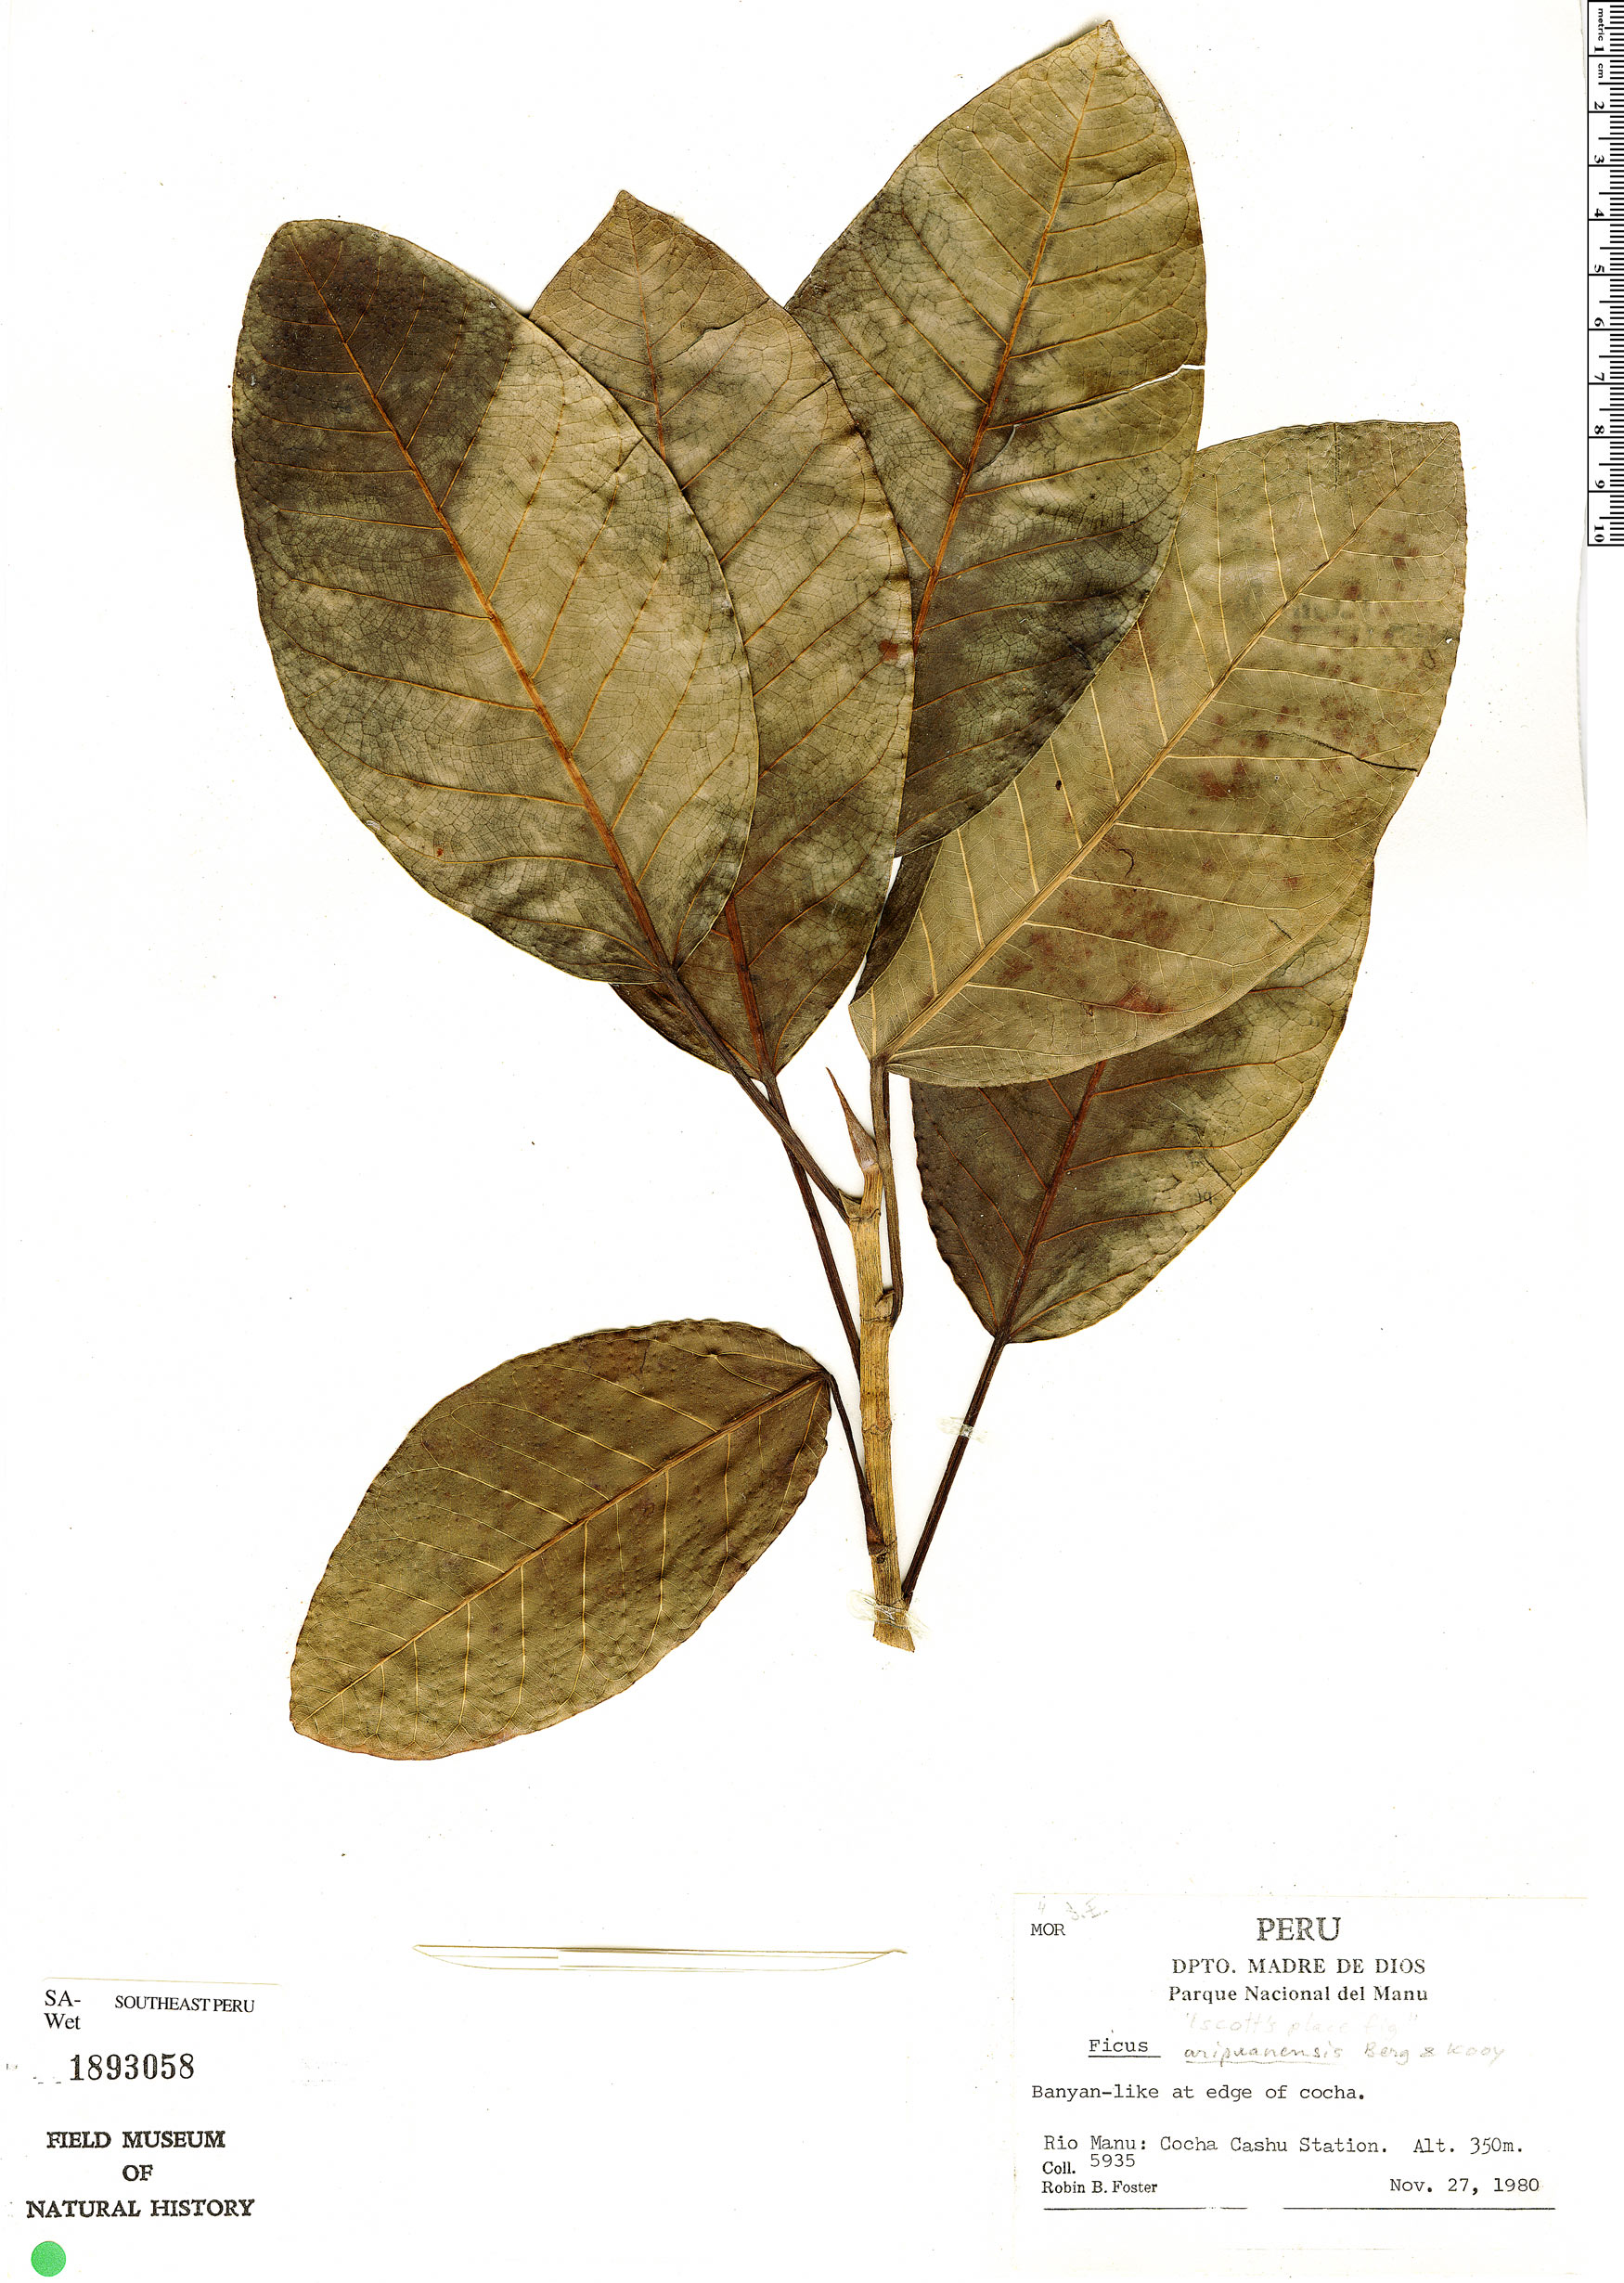 Specimen: Ficus paludica